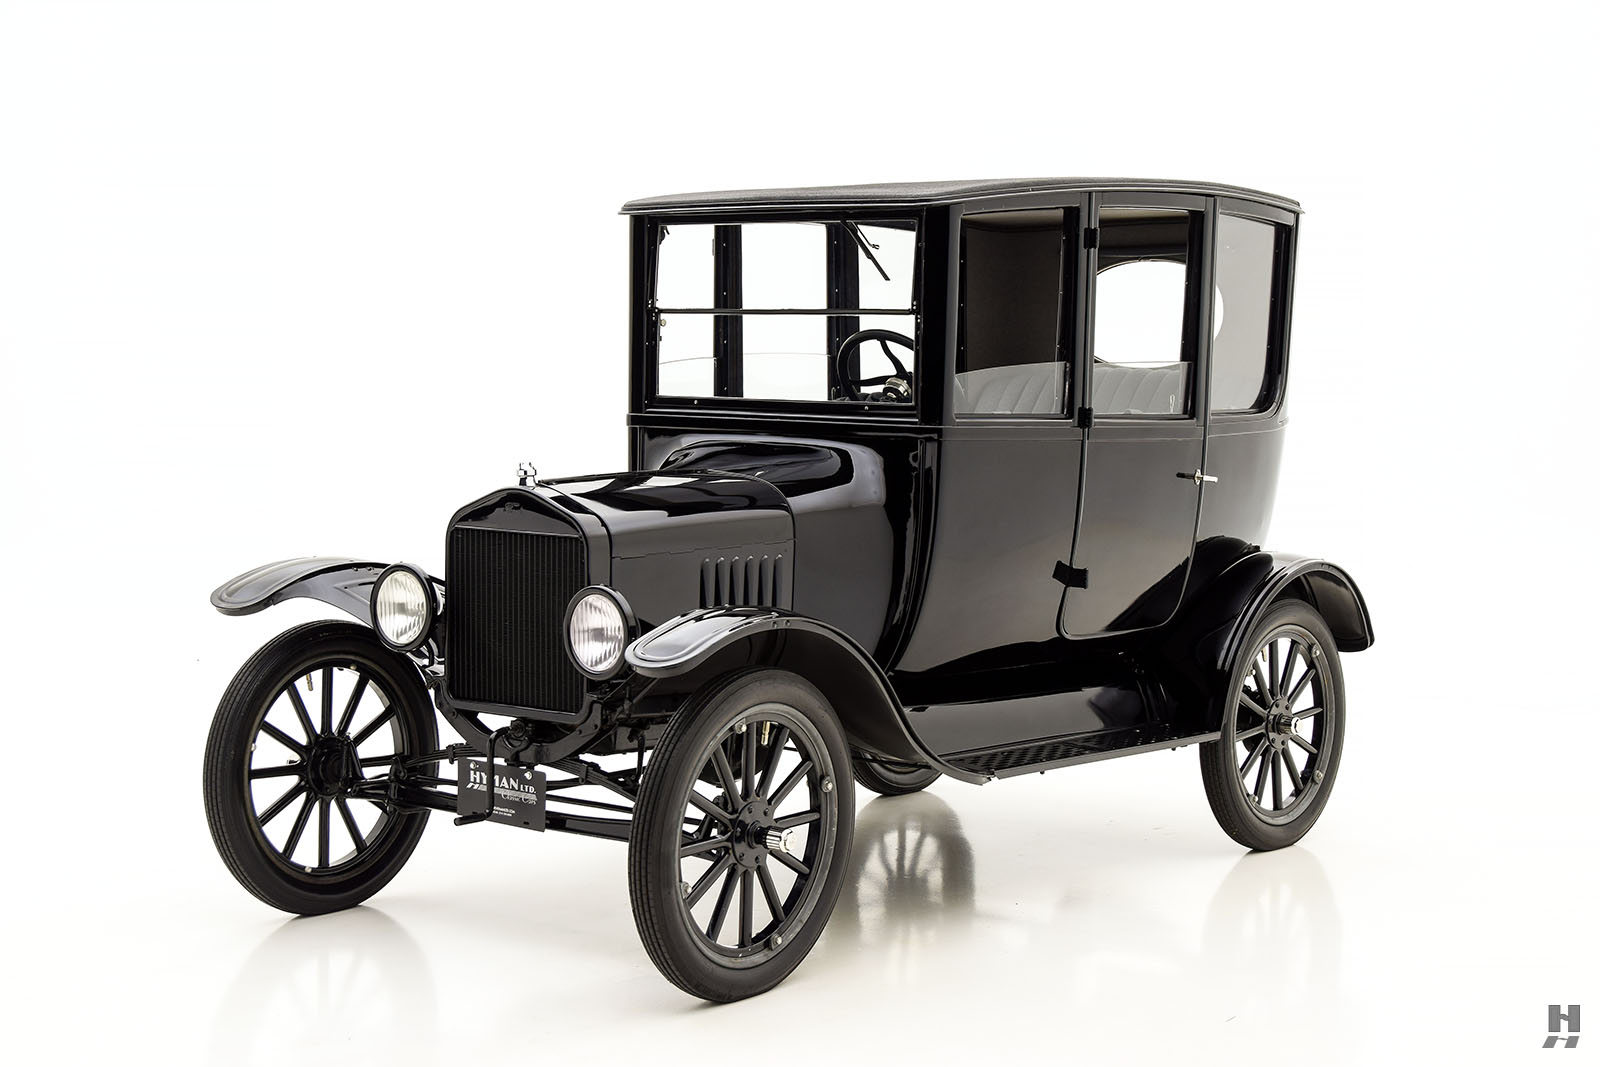 1921 Ford Model T Center Door Sedan For Sale | Classic Cars | Hyman LTD